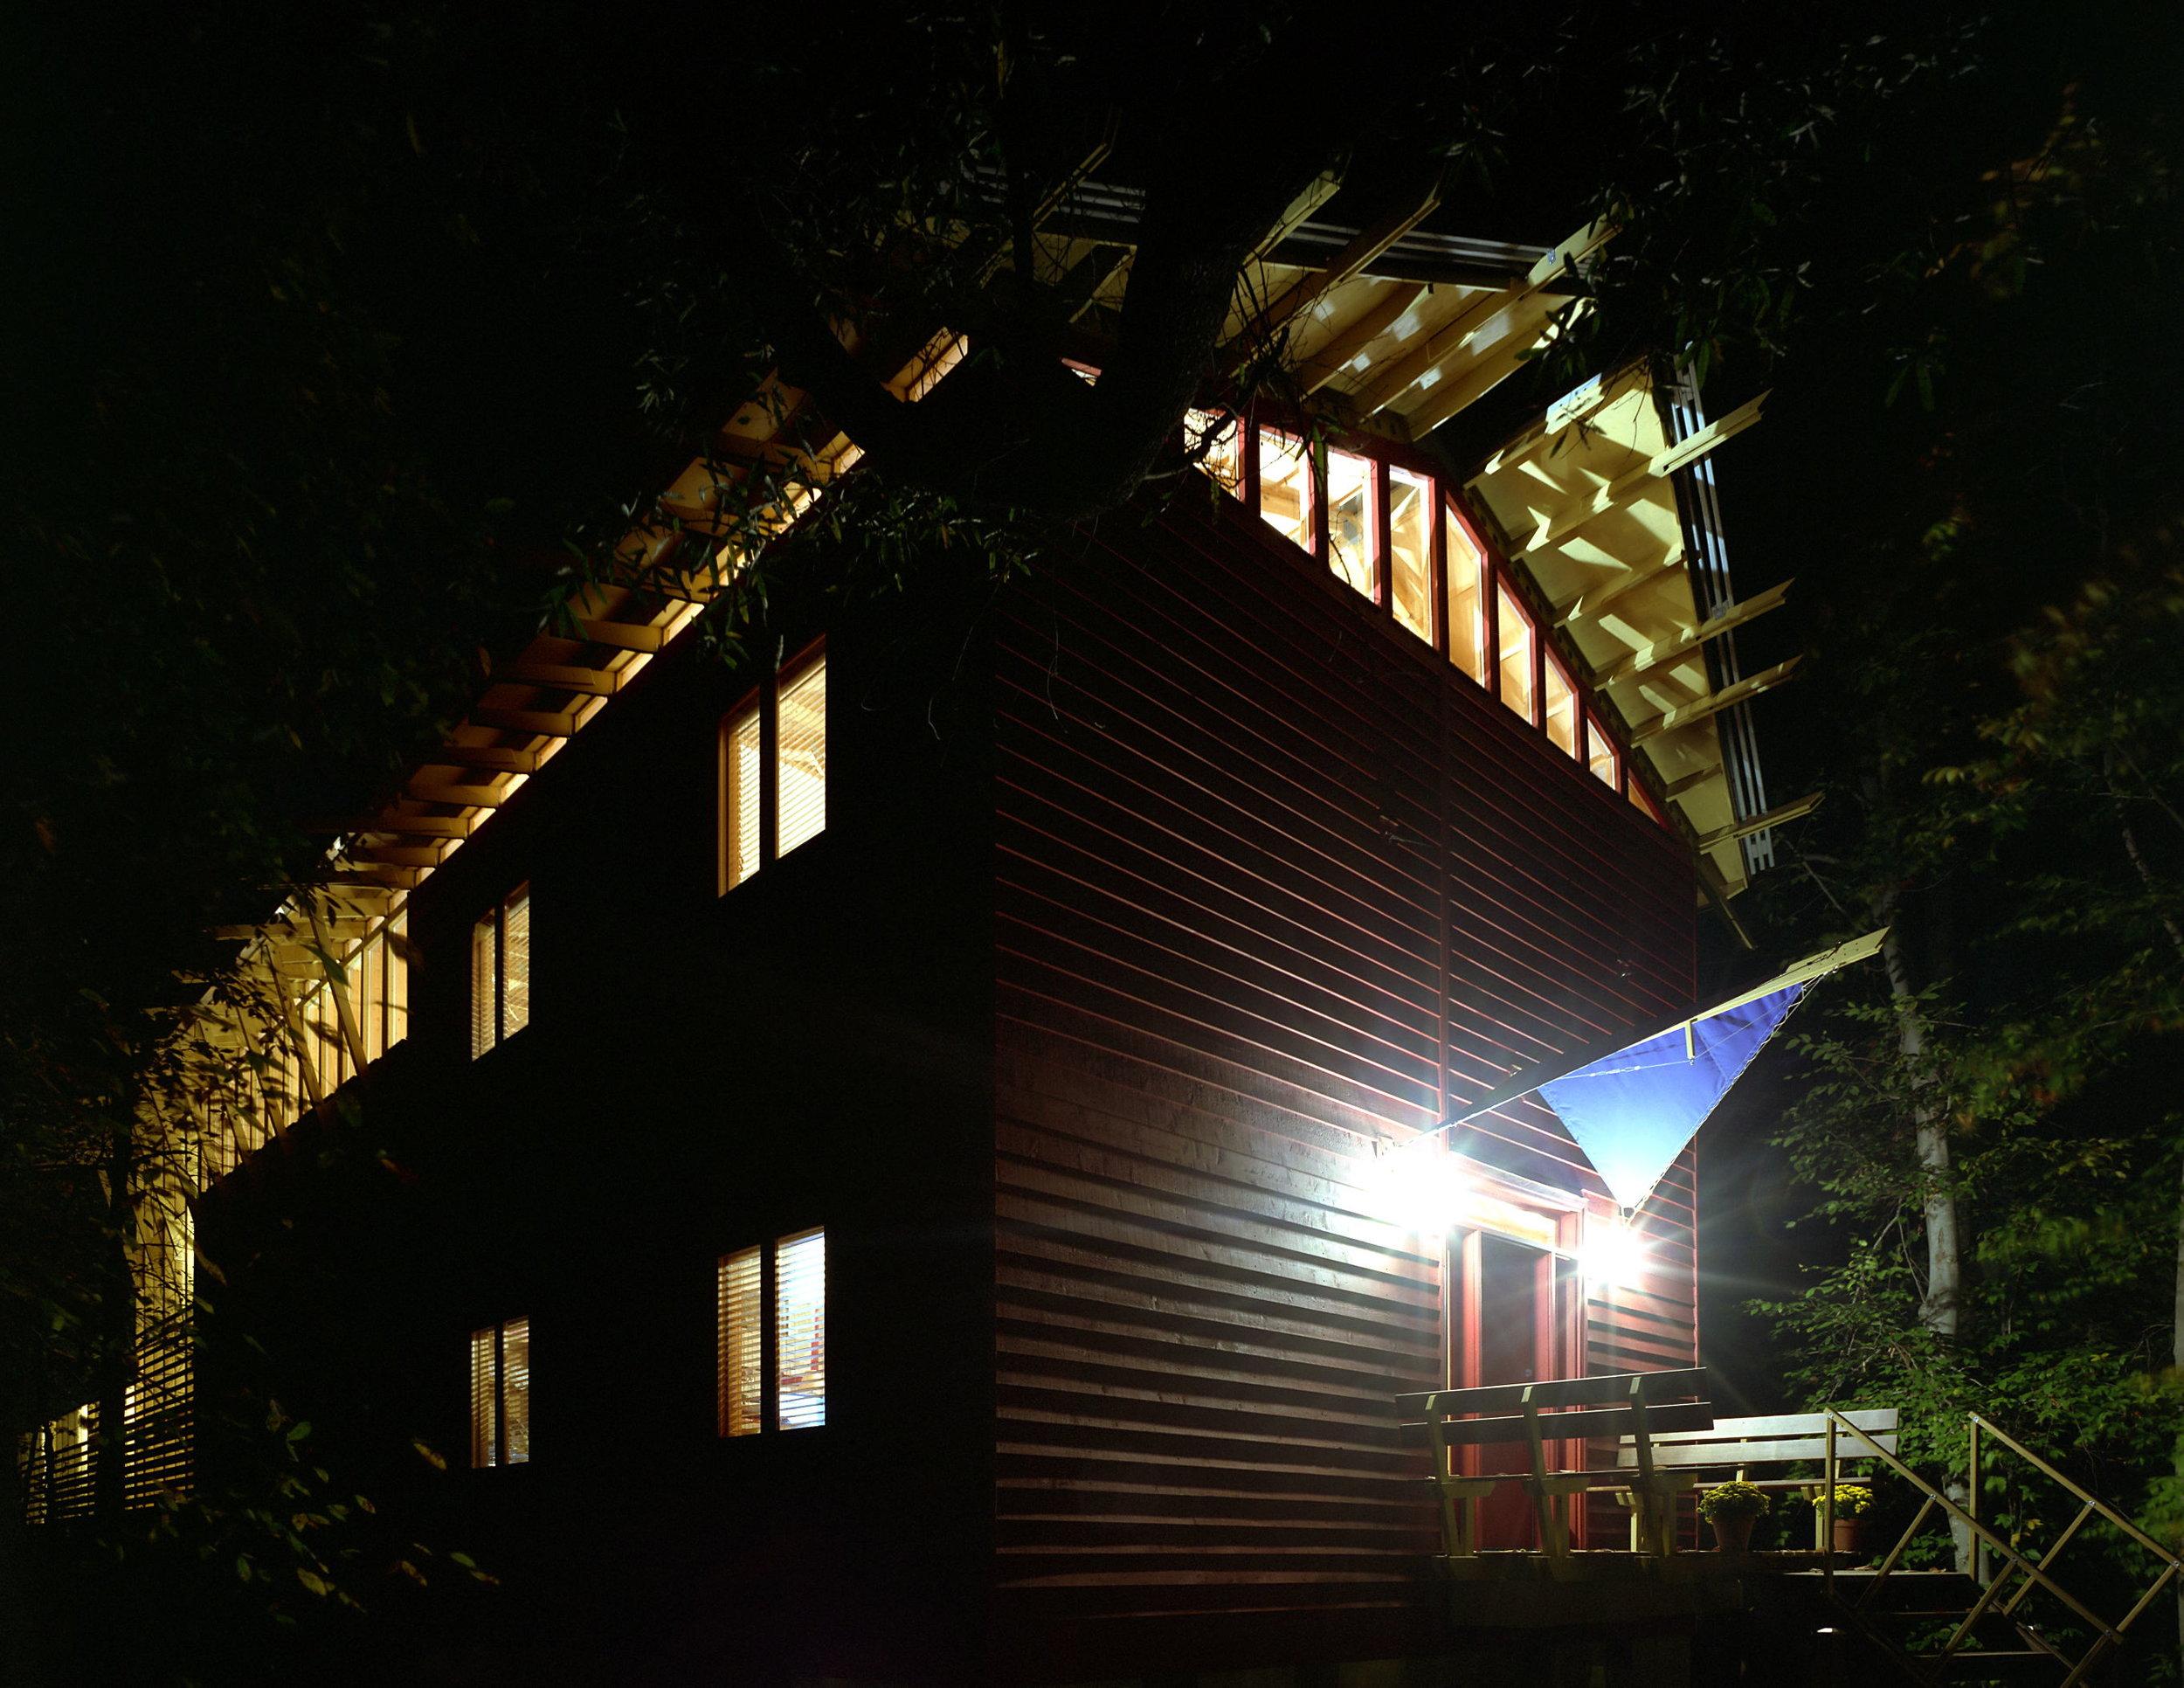 Kazebee House front exterior image